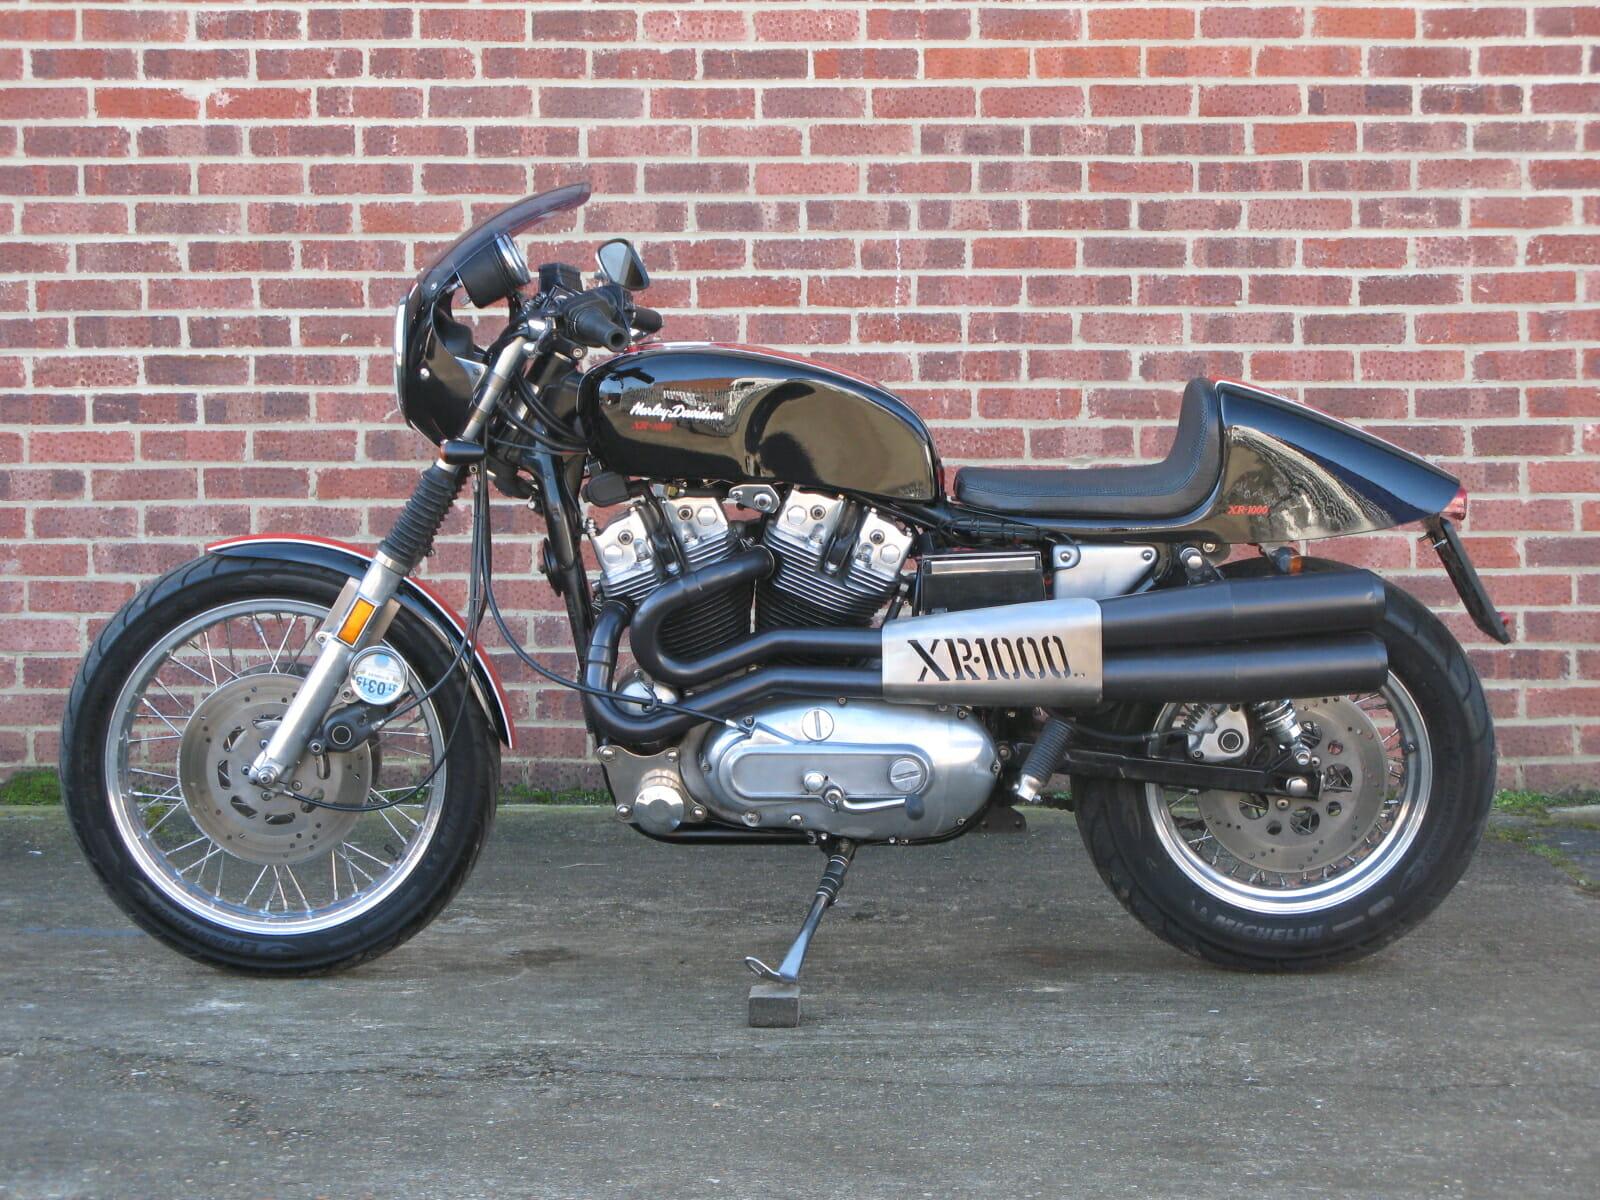 Harley-Davidson XR1000 Cafe Racer | Anthony Godin